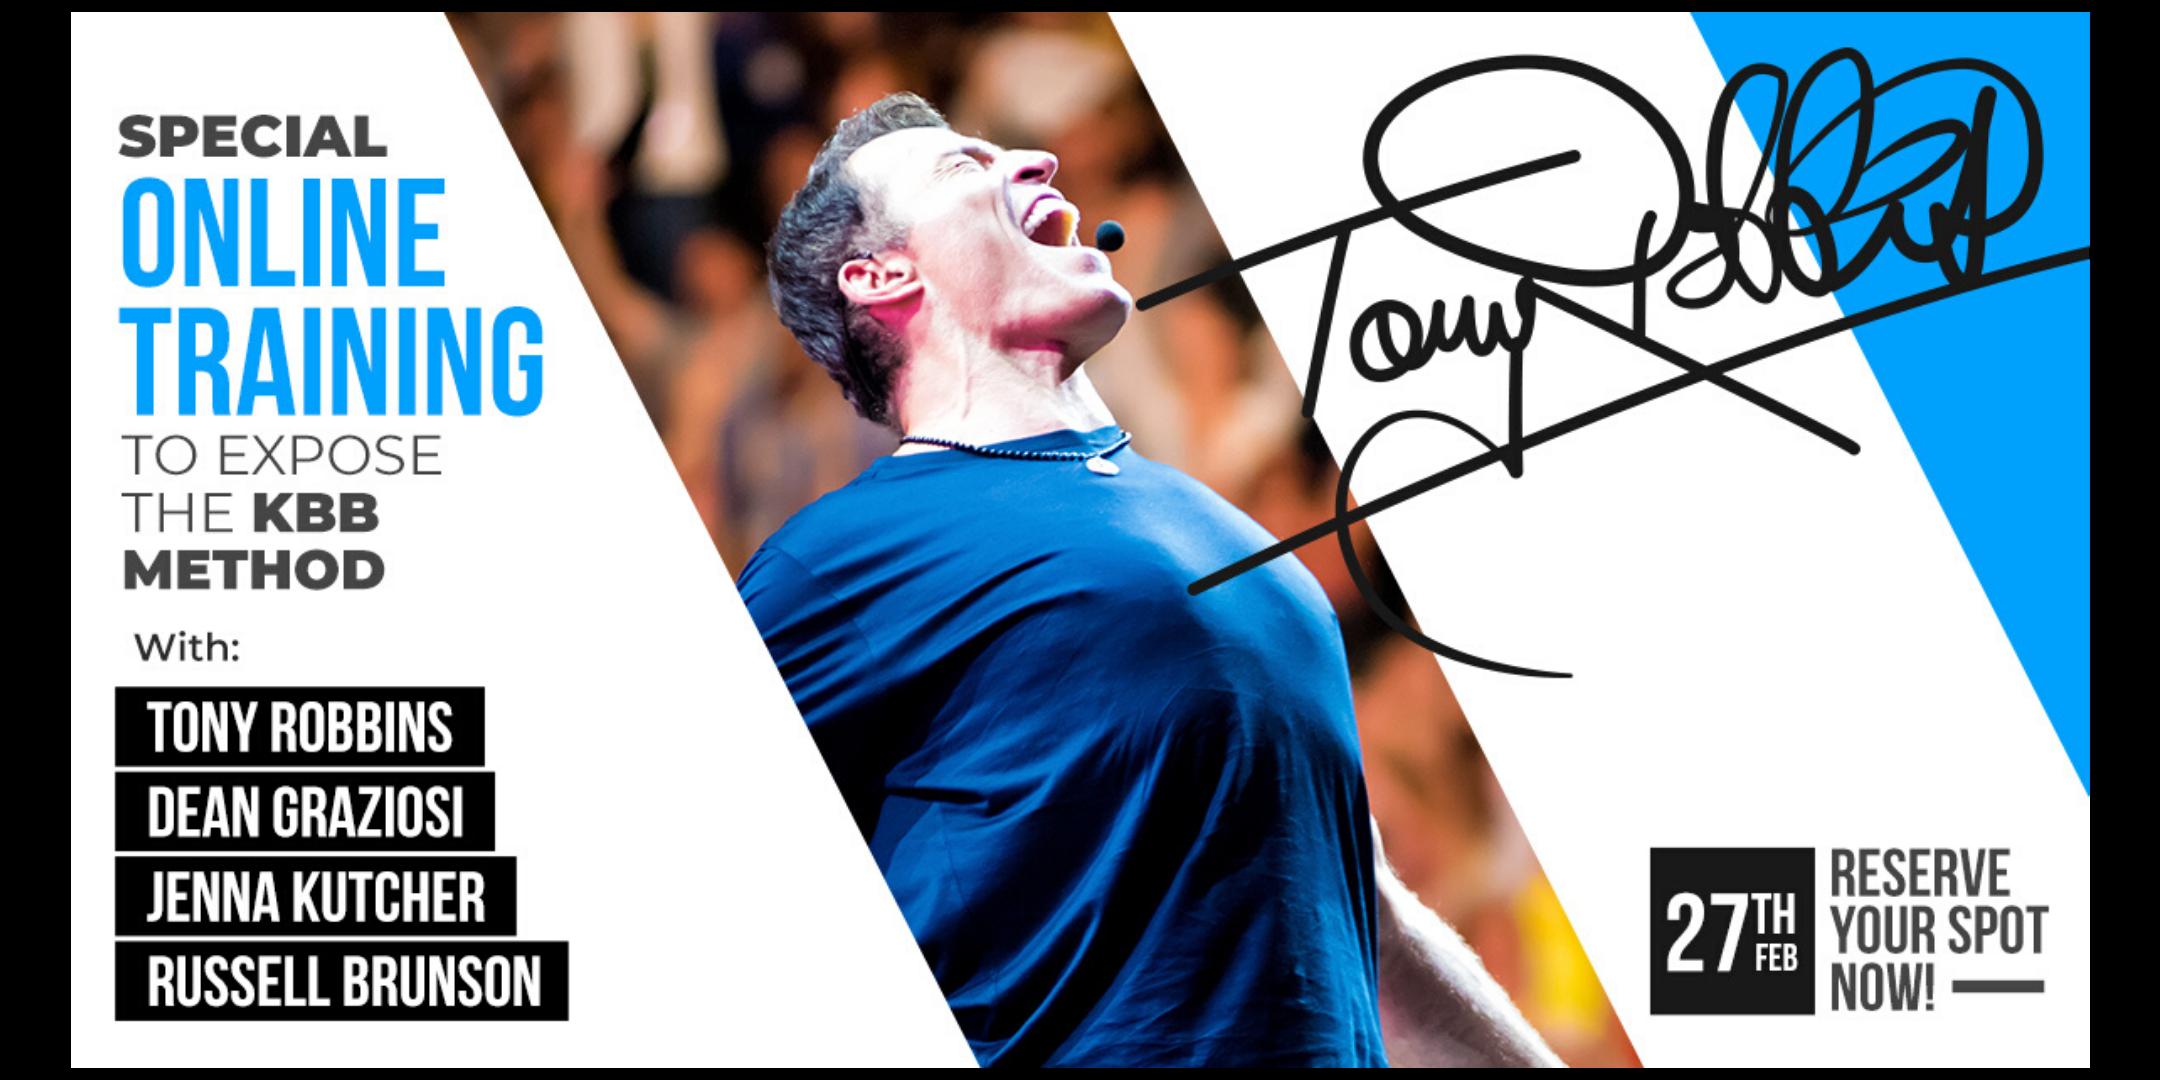 LIVE: TONY ROBBINS & DEAN GRAZIOSI Event! (San Diego) *HAPPENING 2/27/20*